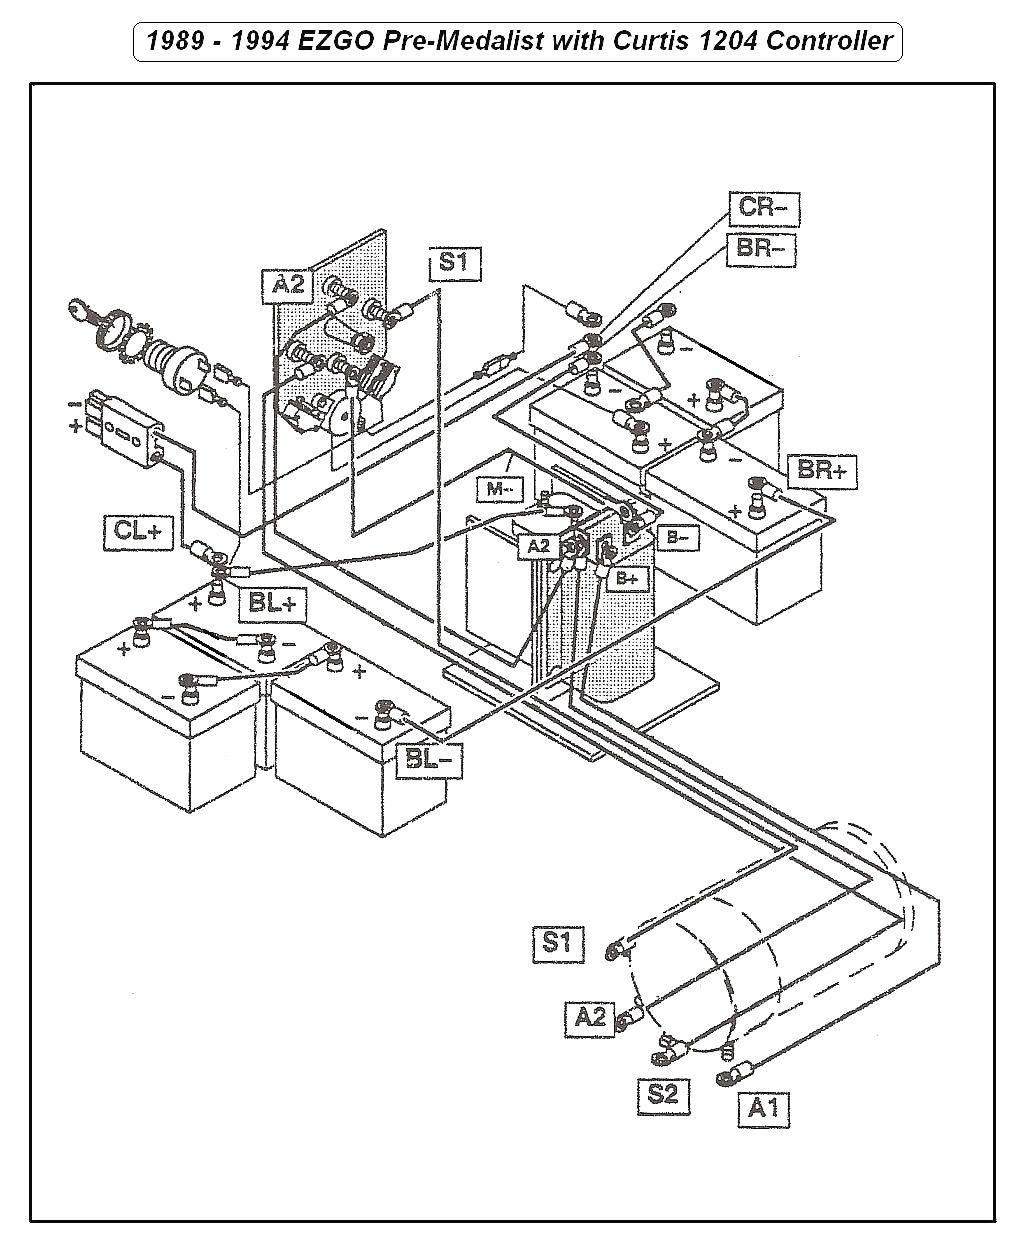 club car 36 volt wiring diagram free wiring diagram in 2020 | Ezgo golf cart,  Electric golf cart, Golf cart partsPinterest